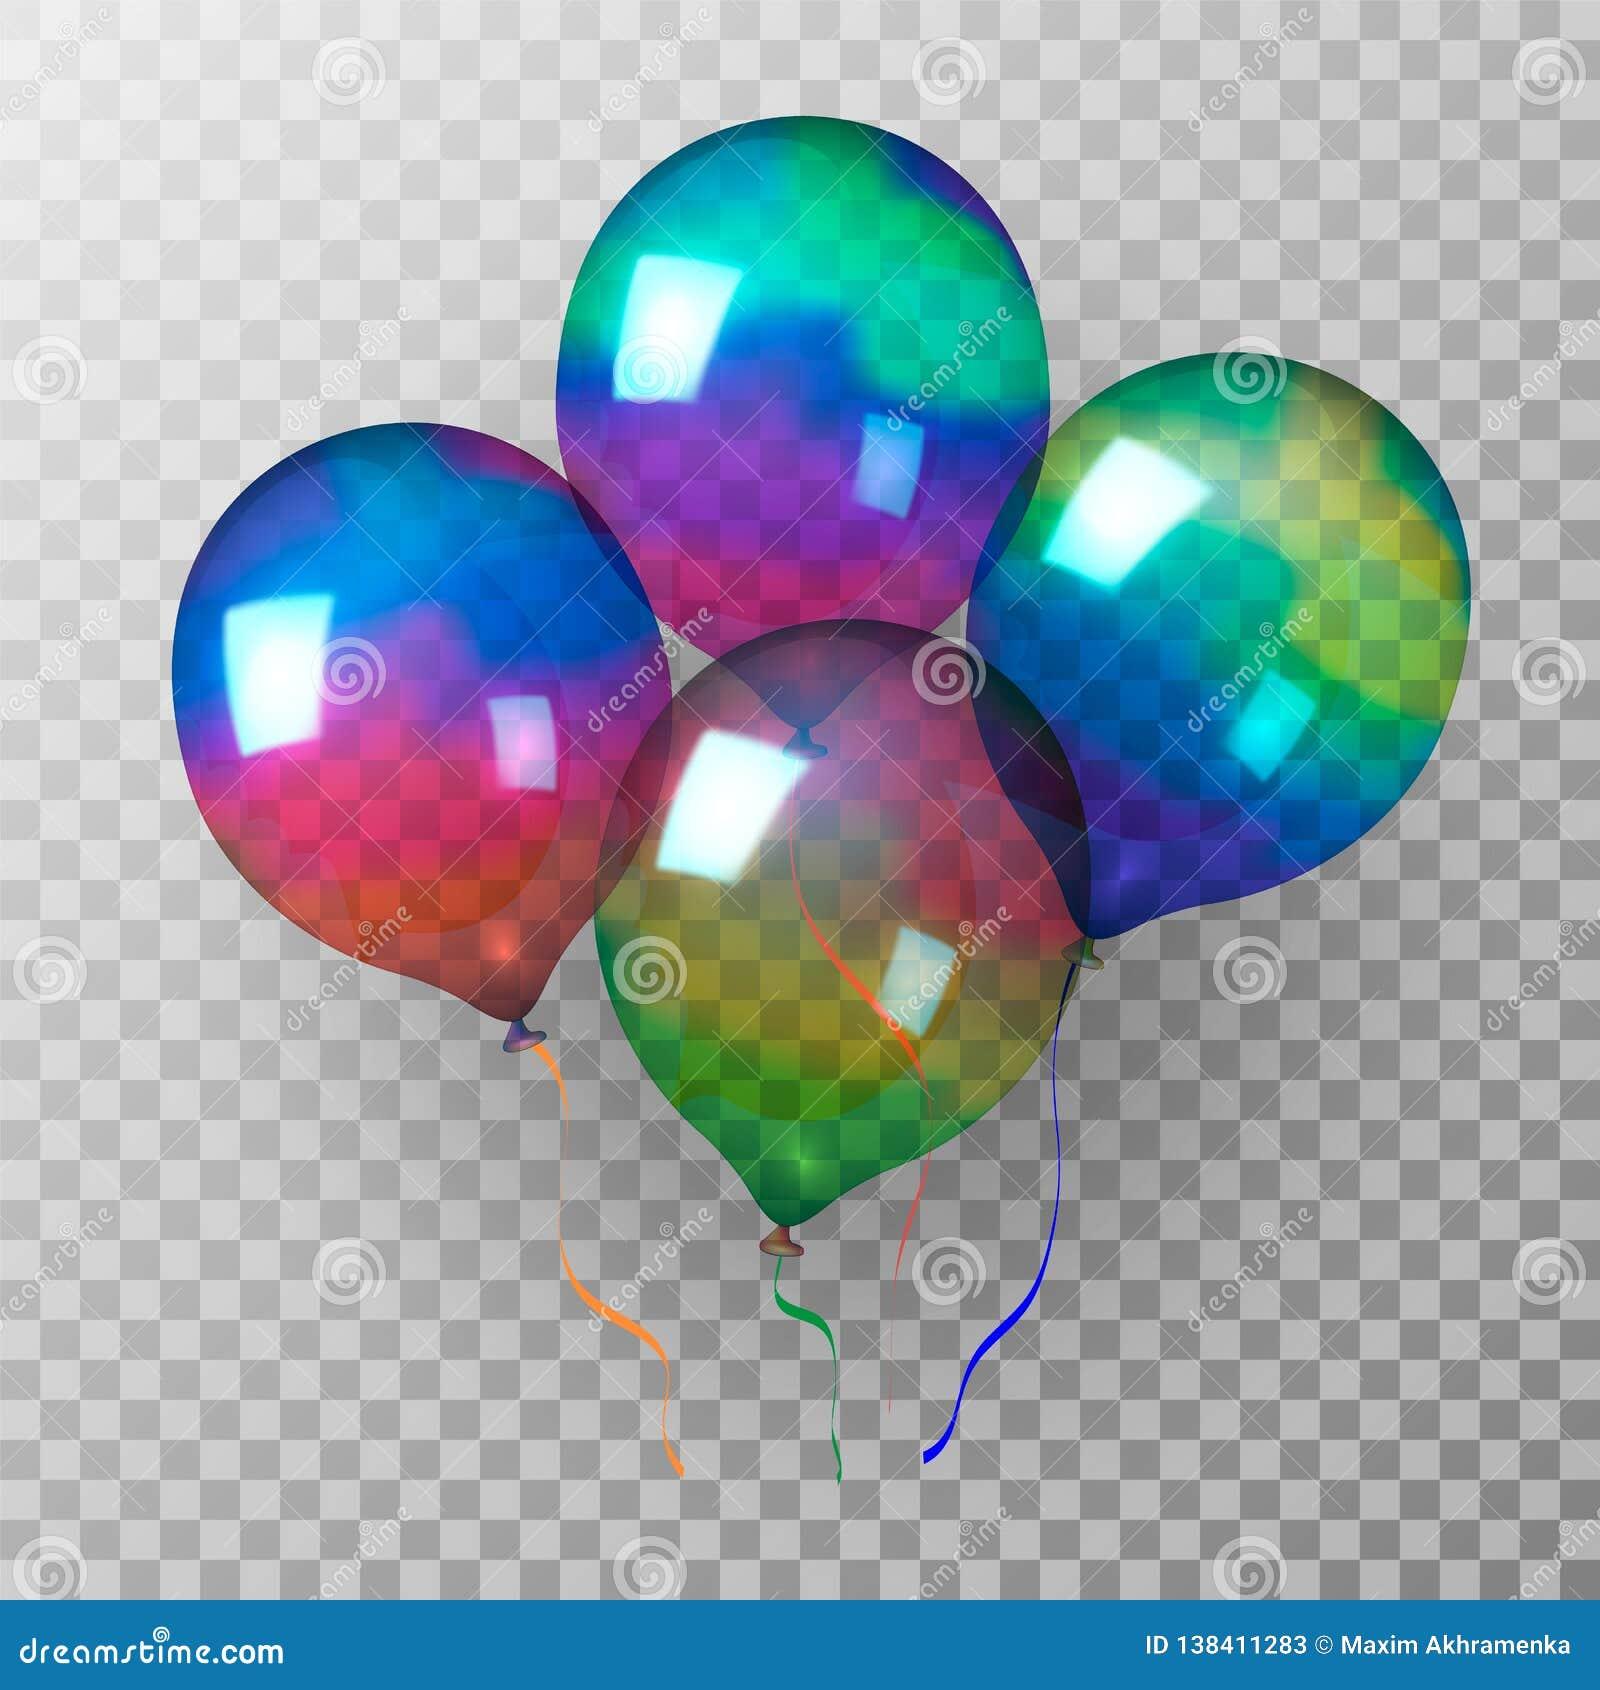 Multi-colored flikkerende transparante opblaasbare ballen Vector illustratie